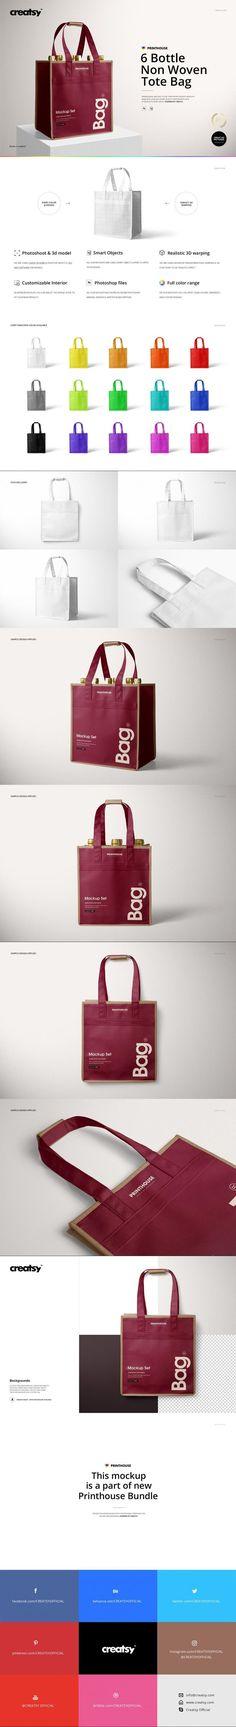 6 Bottle Non Woven Tote Bag Mockups #MockupTemplates #customizable #amazon #template #promotional #highquality #psd #dressing #overlaytext #creatsy #stationery #mockupbundle #reusable #scenecreator #weddingsavethedate #mockups #girls #custom #bundle